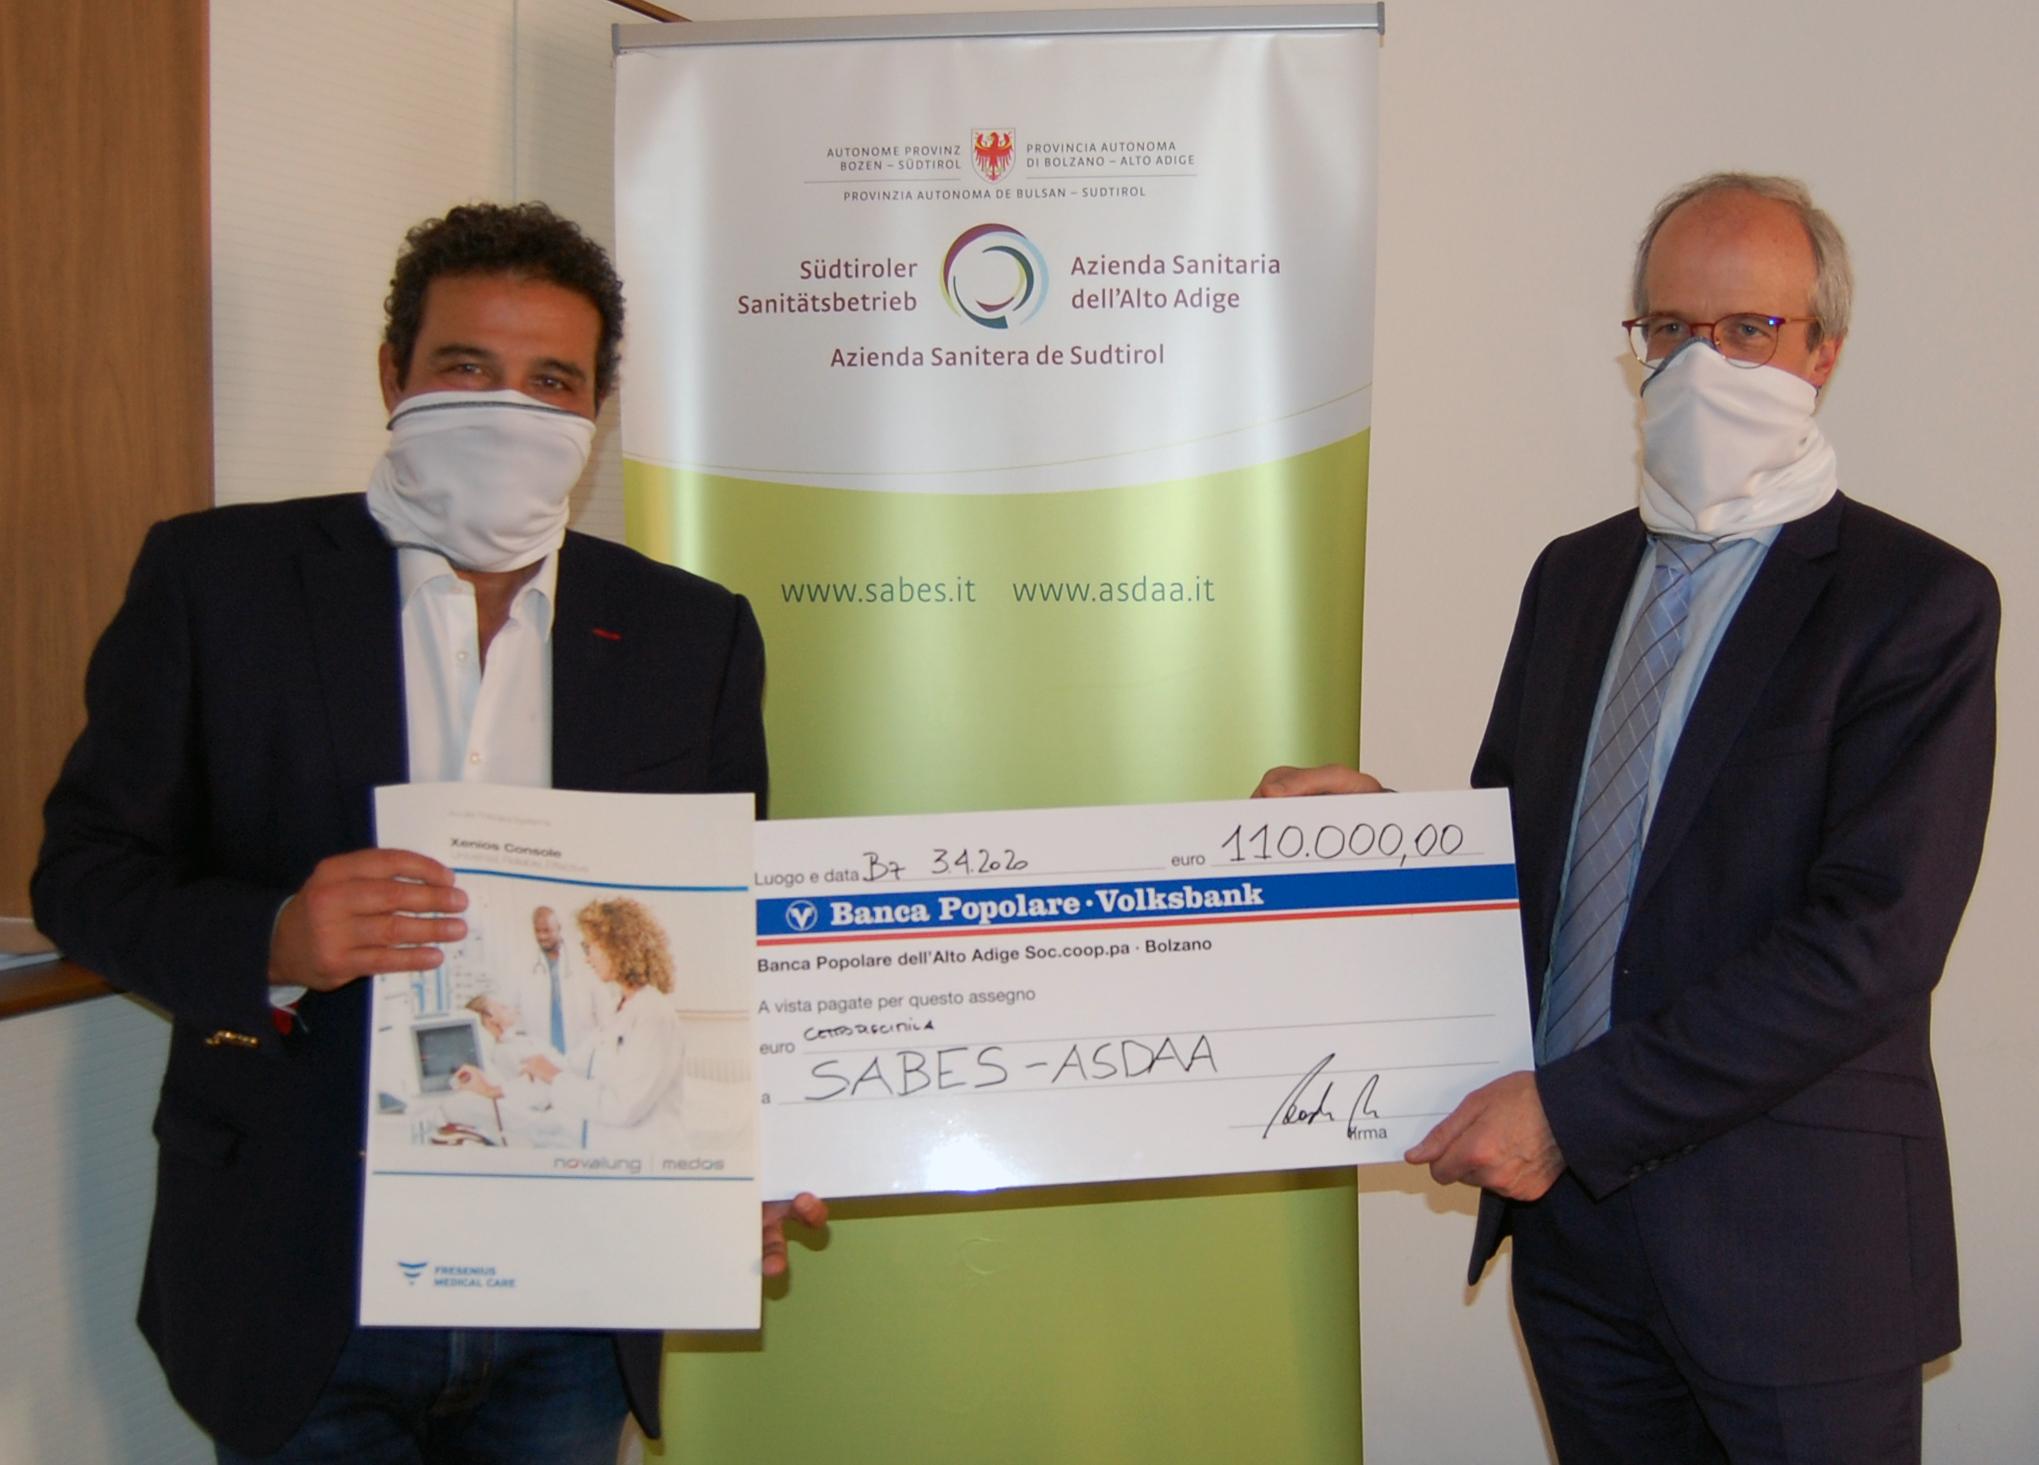 Lebensrettendes Gerät Dank Der Podini Stiftung